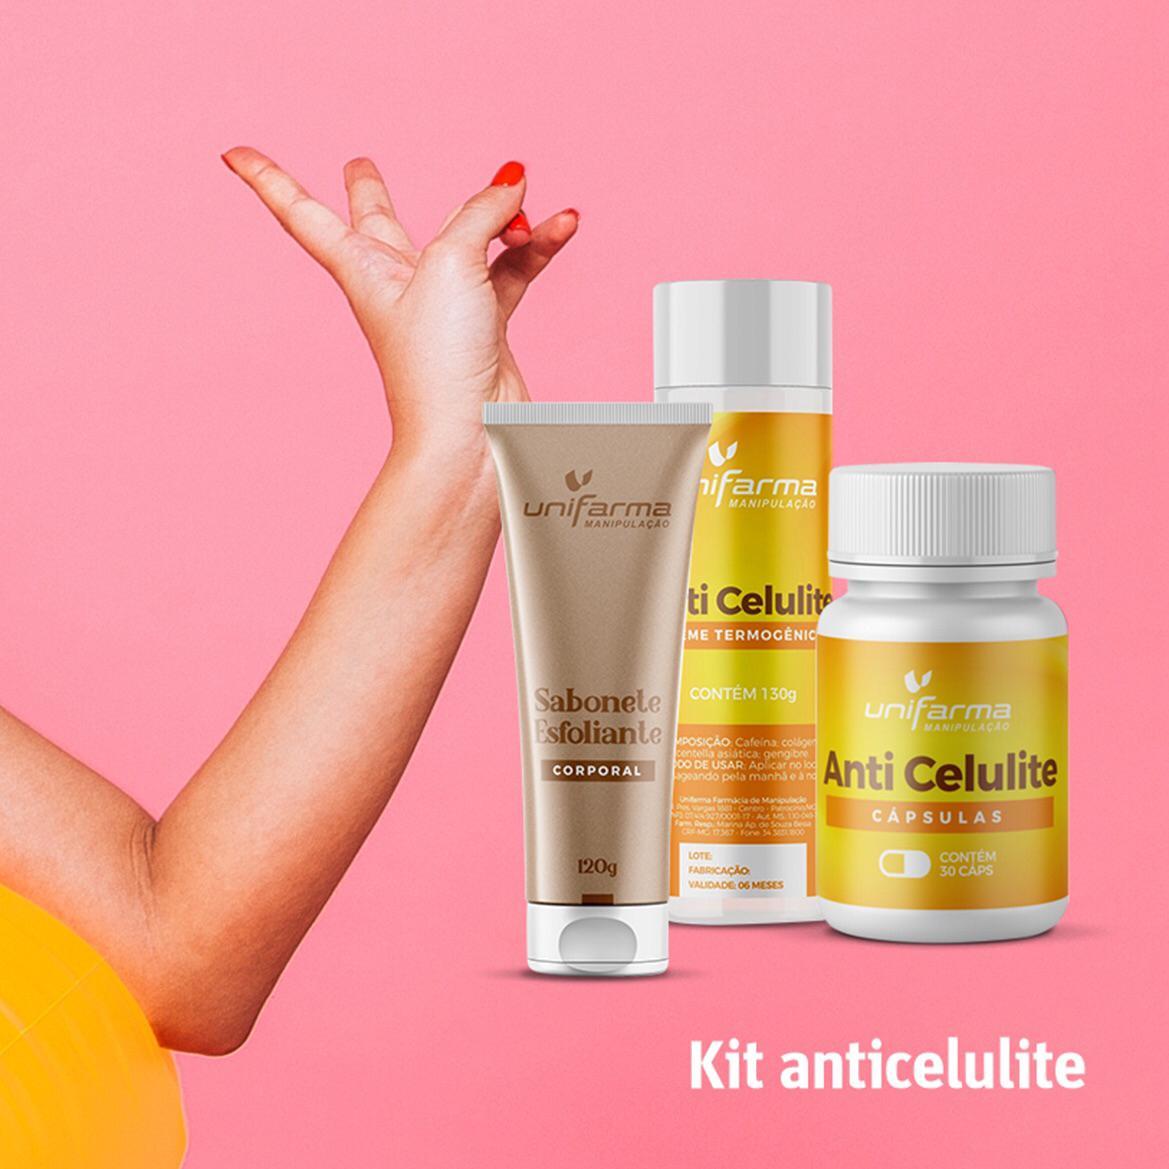 Kit Anti Celulite